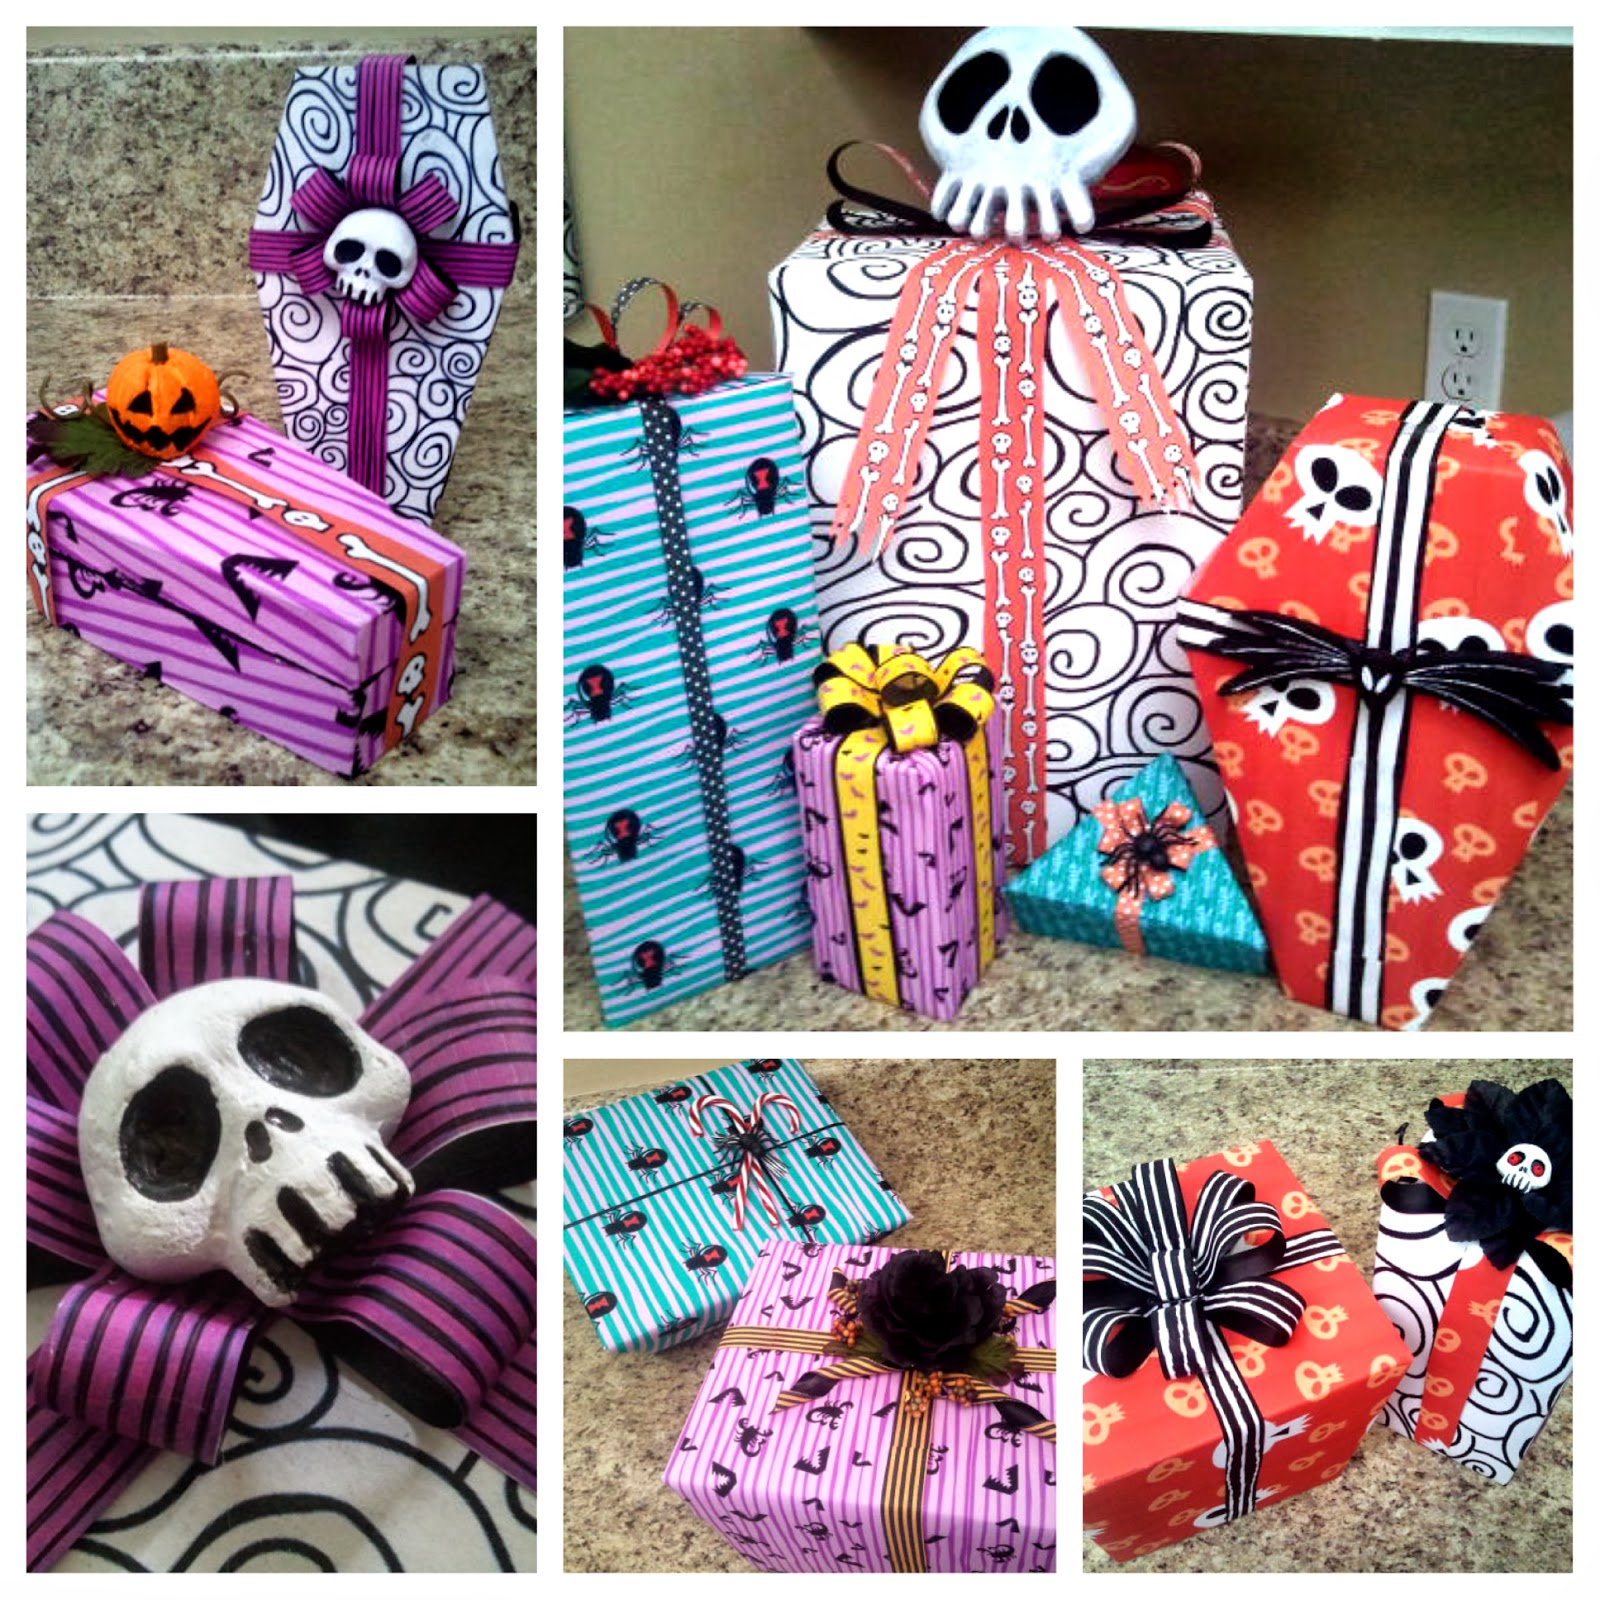 Christmas Present Decorations: DIY Nightmare Before Christmas Halloween Props: Nightmare